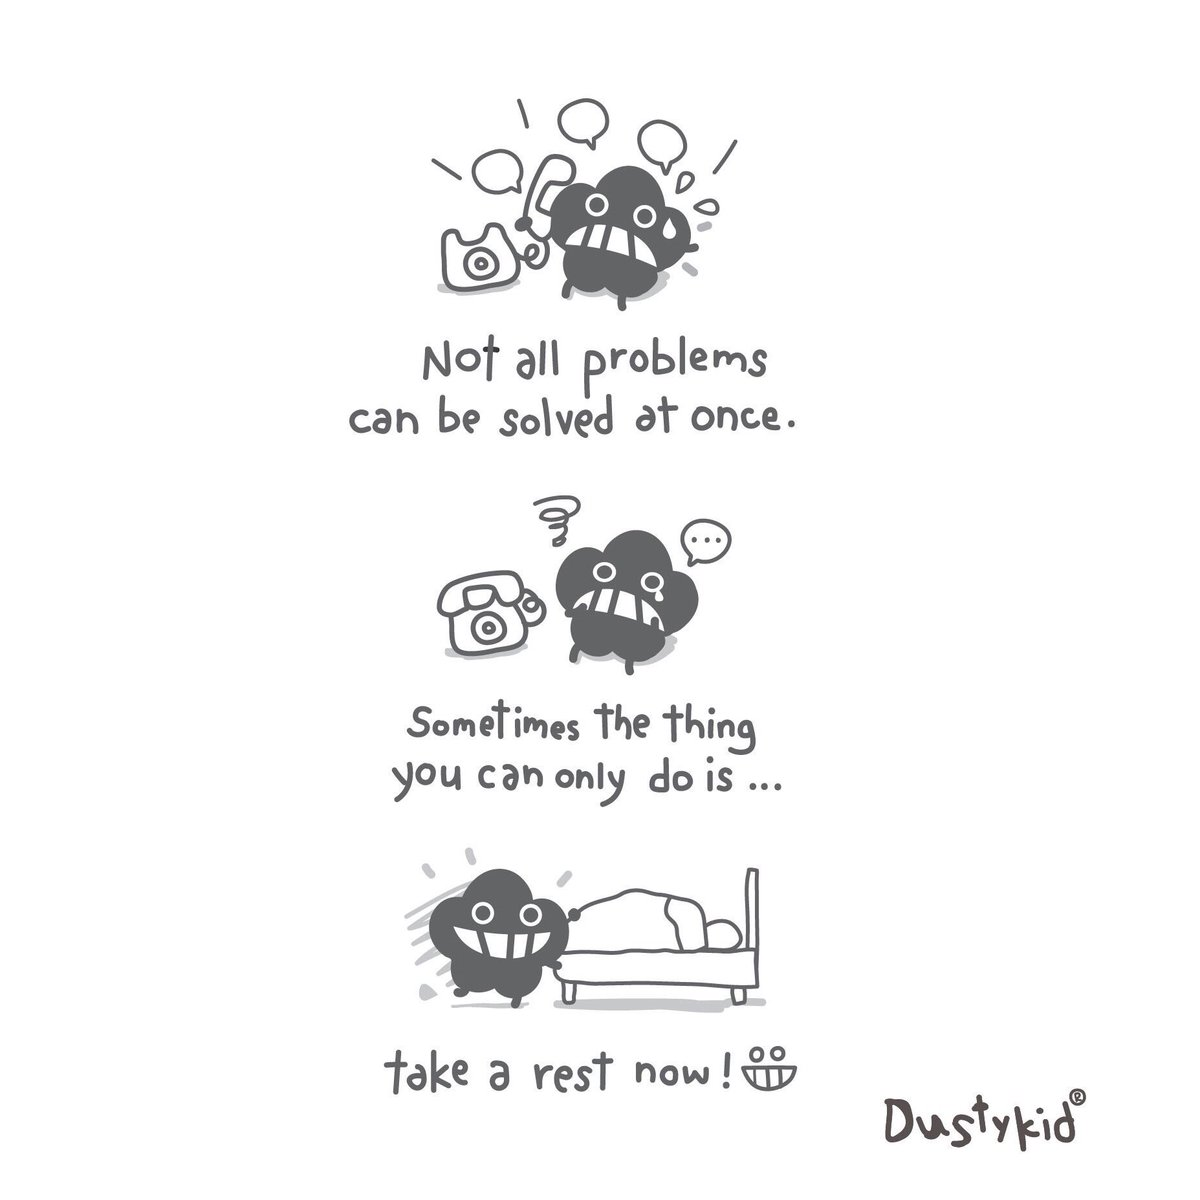 Dustykid on Twitter: \